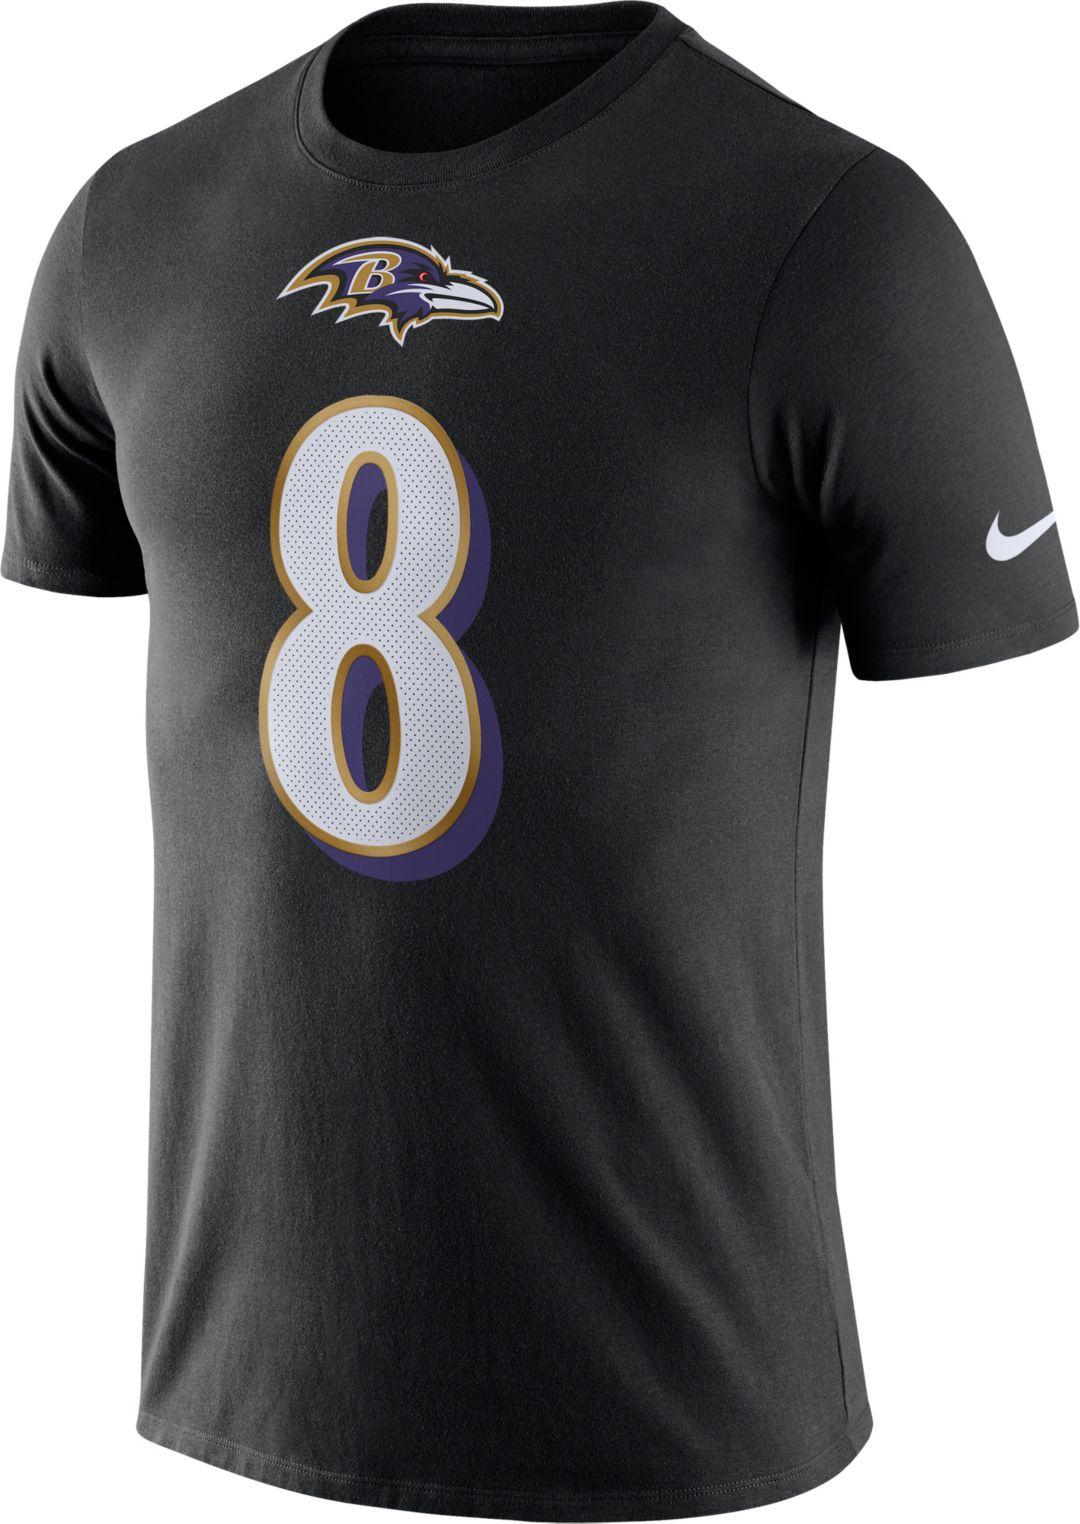 9b4d026d Nike Men's Baltimore Ravens Lamar Jackson #8 Logo Black T-Shirt ...